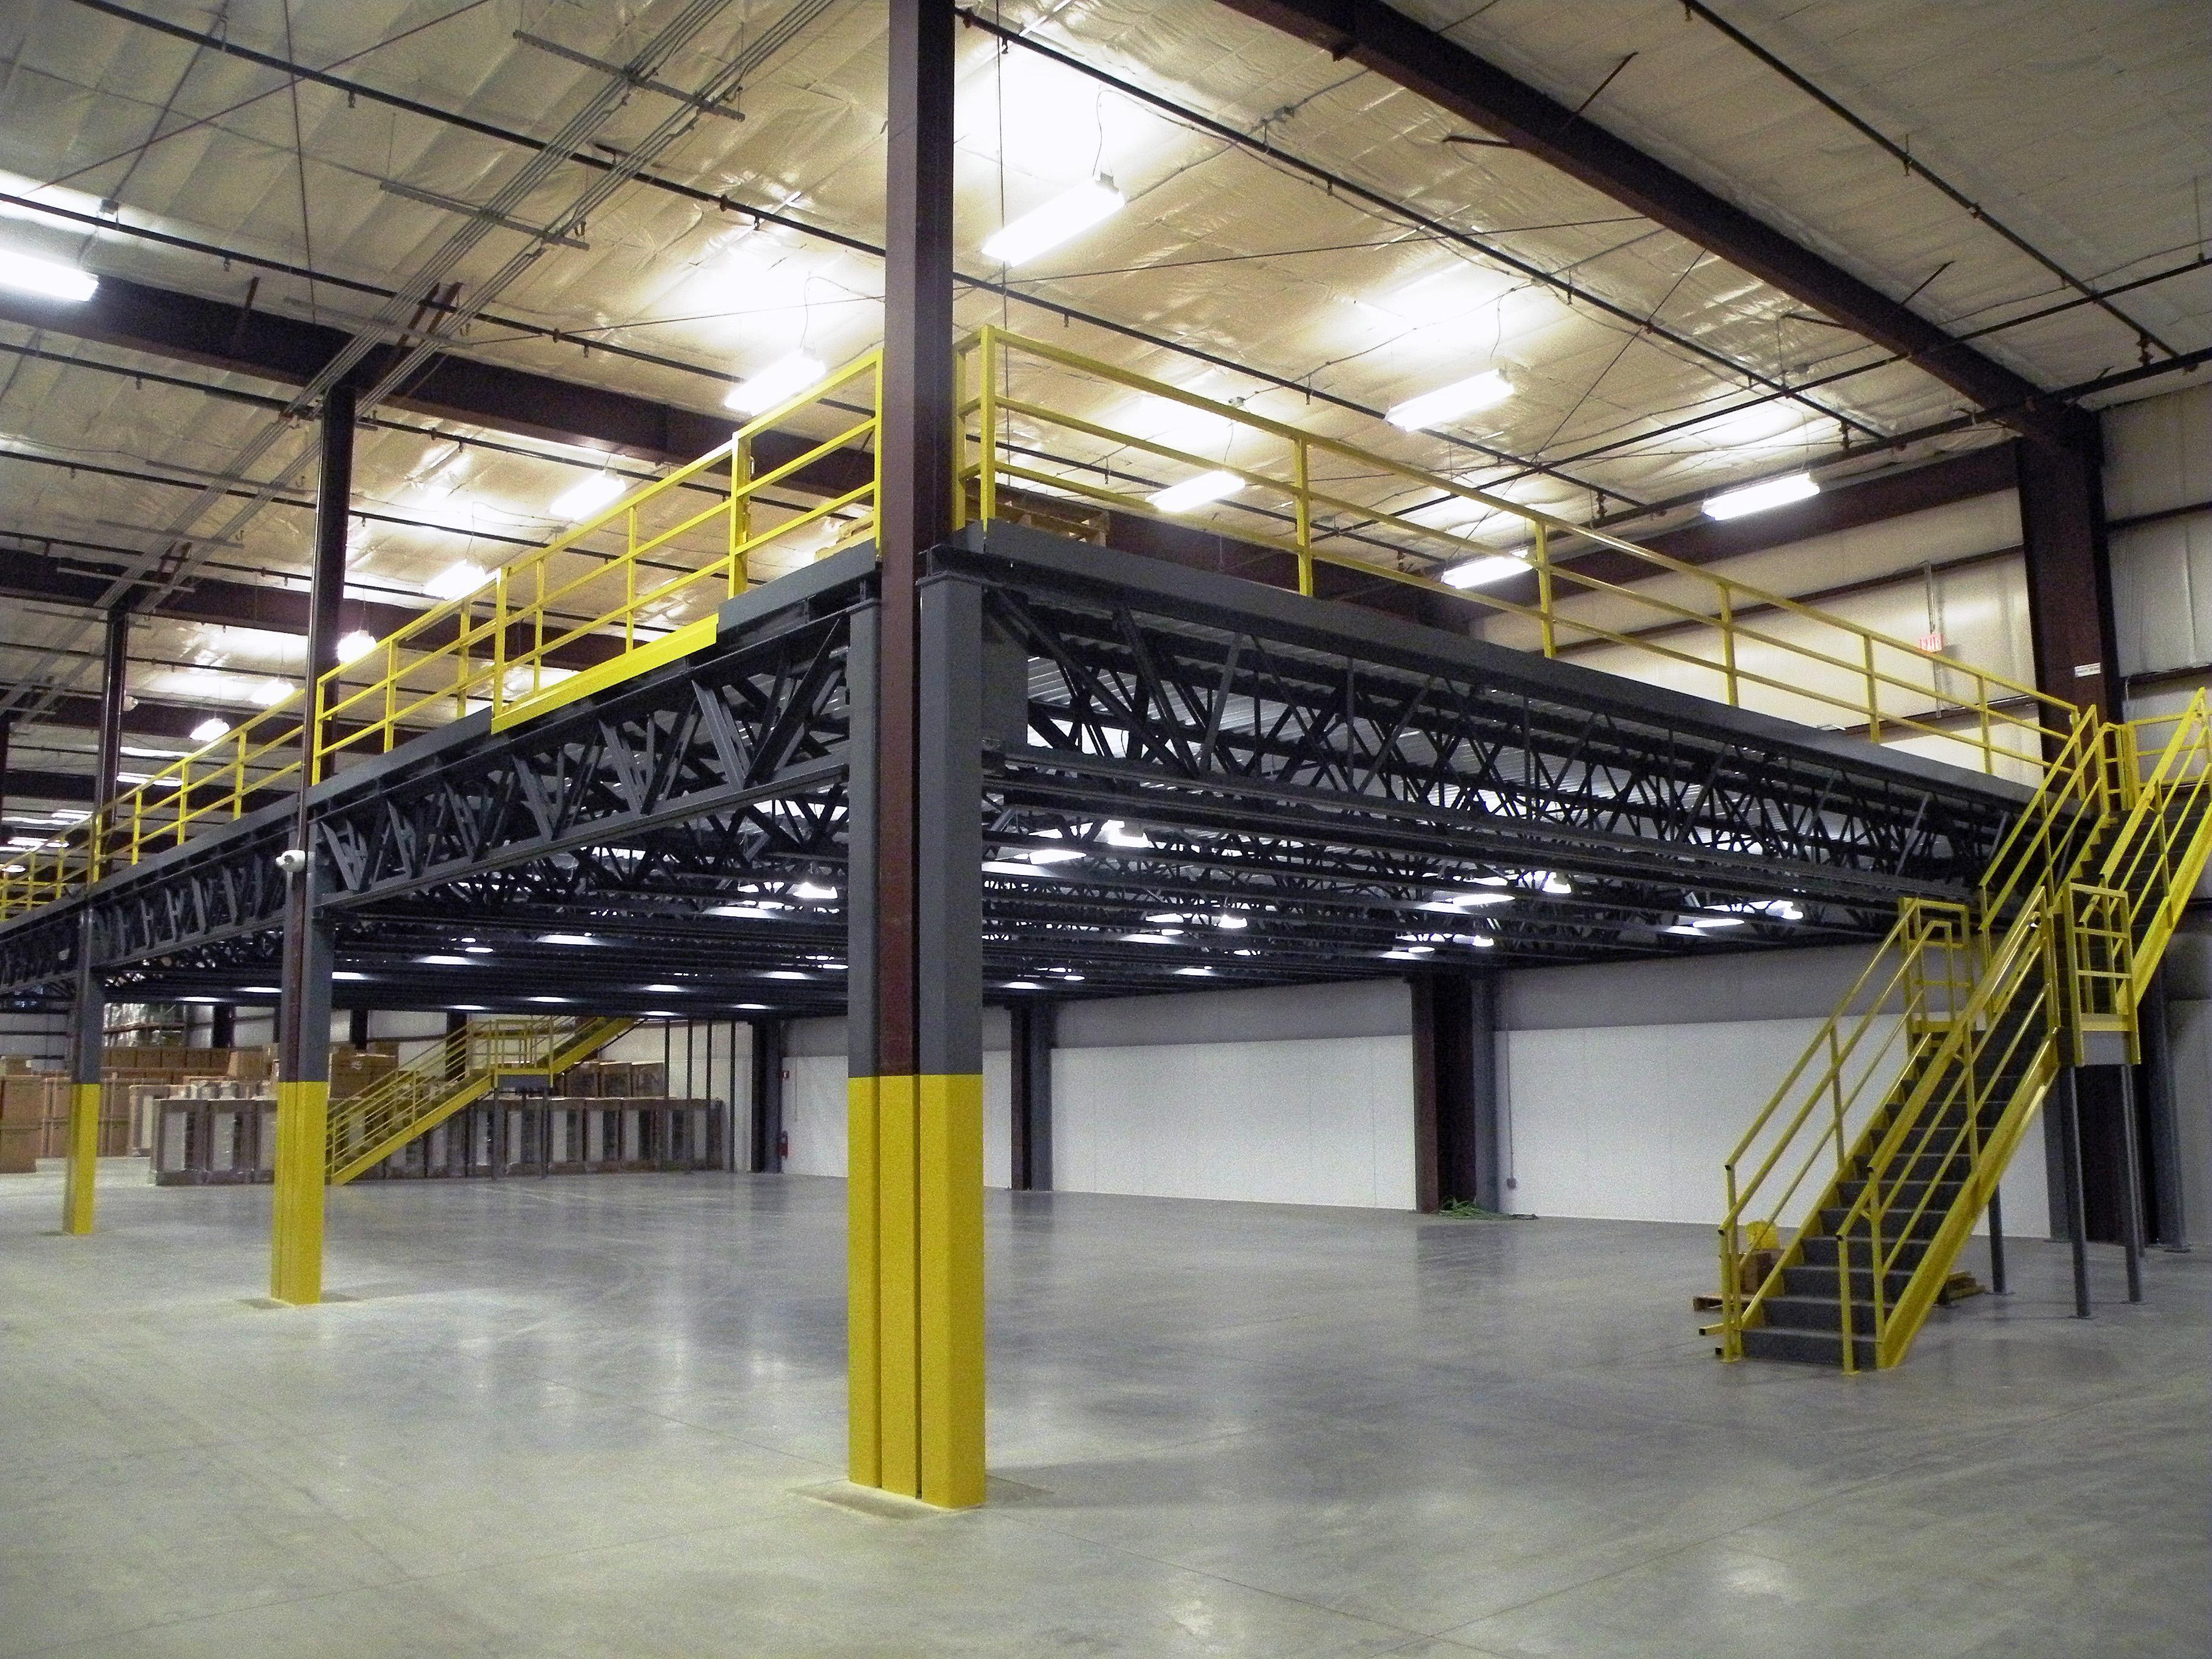 warehouse mezzanine modular office. Mezzanine Systems Warehouse Modular Office